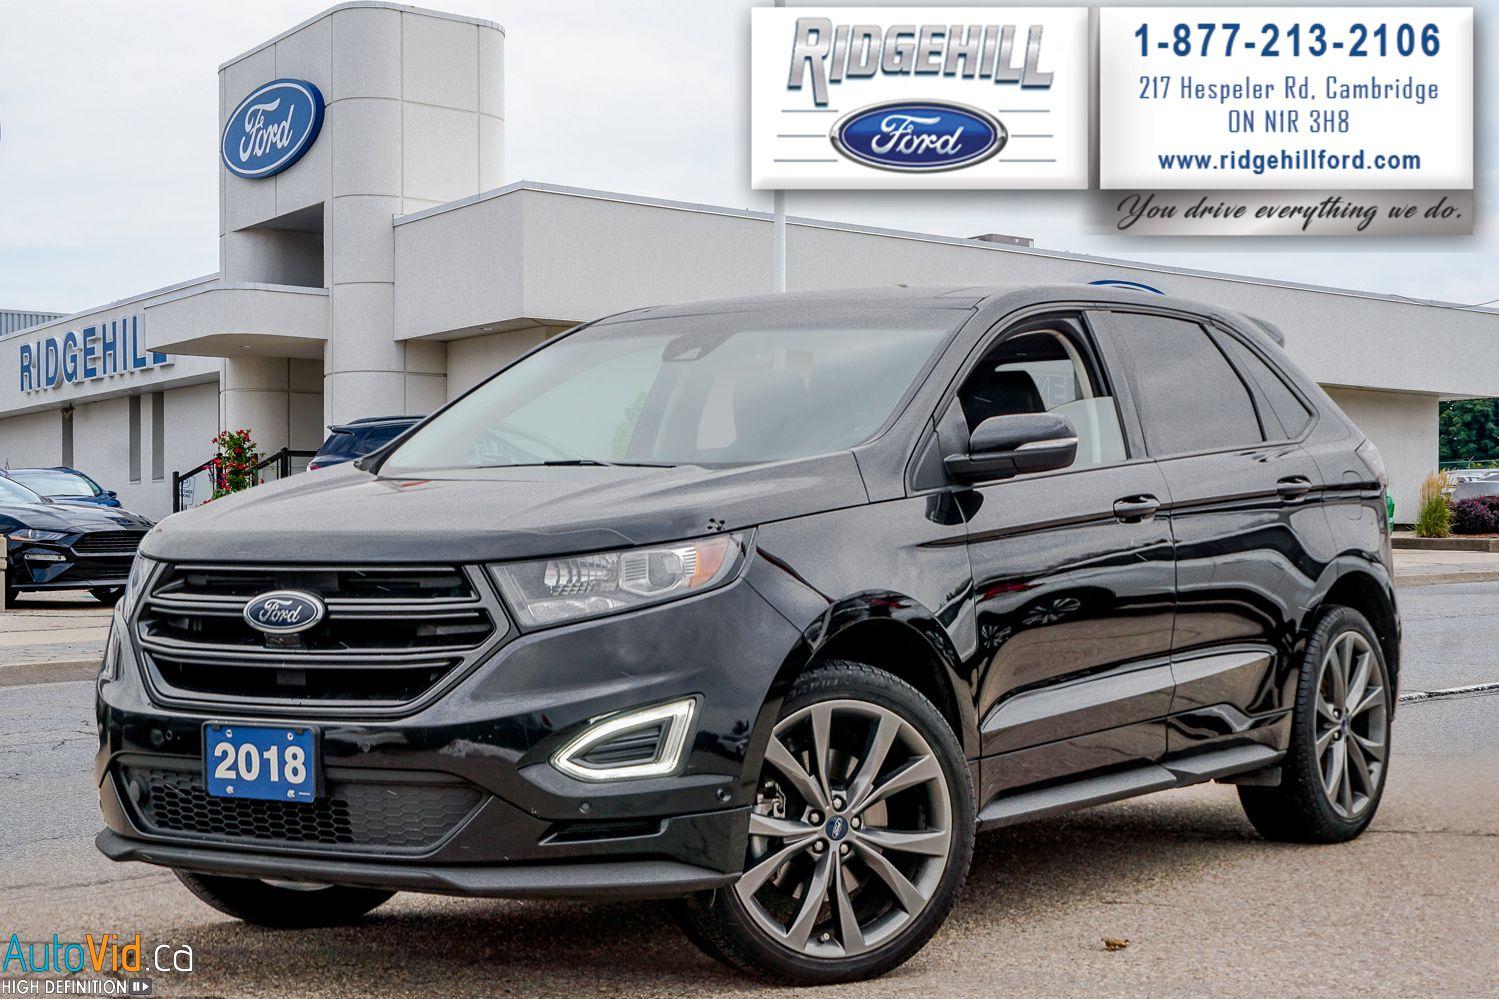 2018 Ford Edge Image